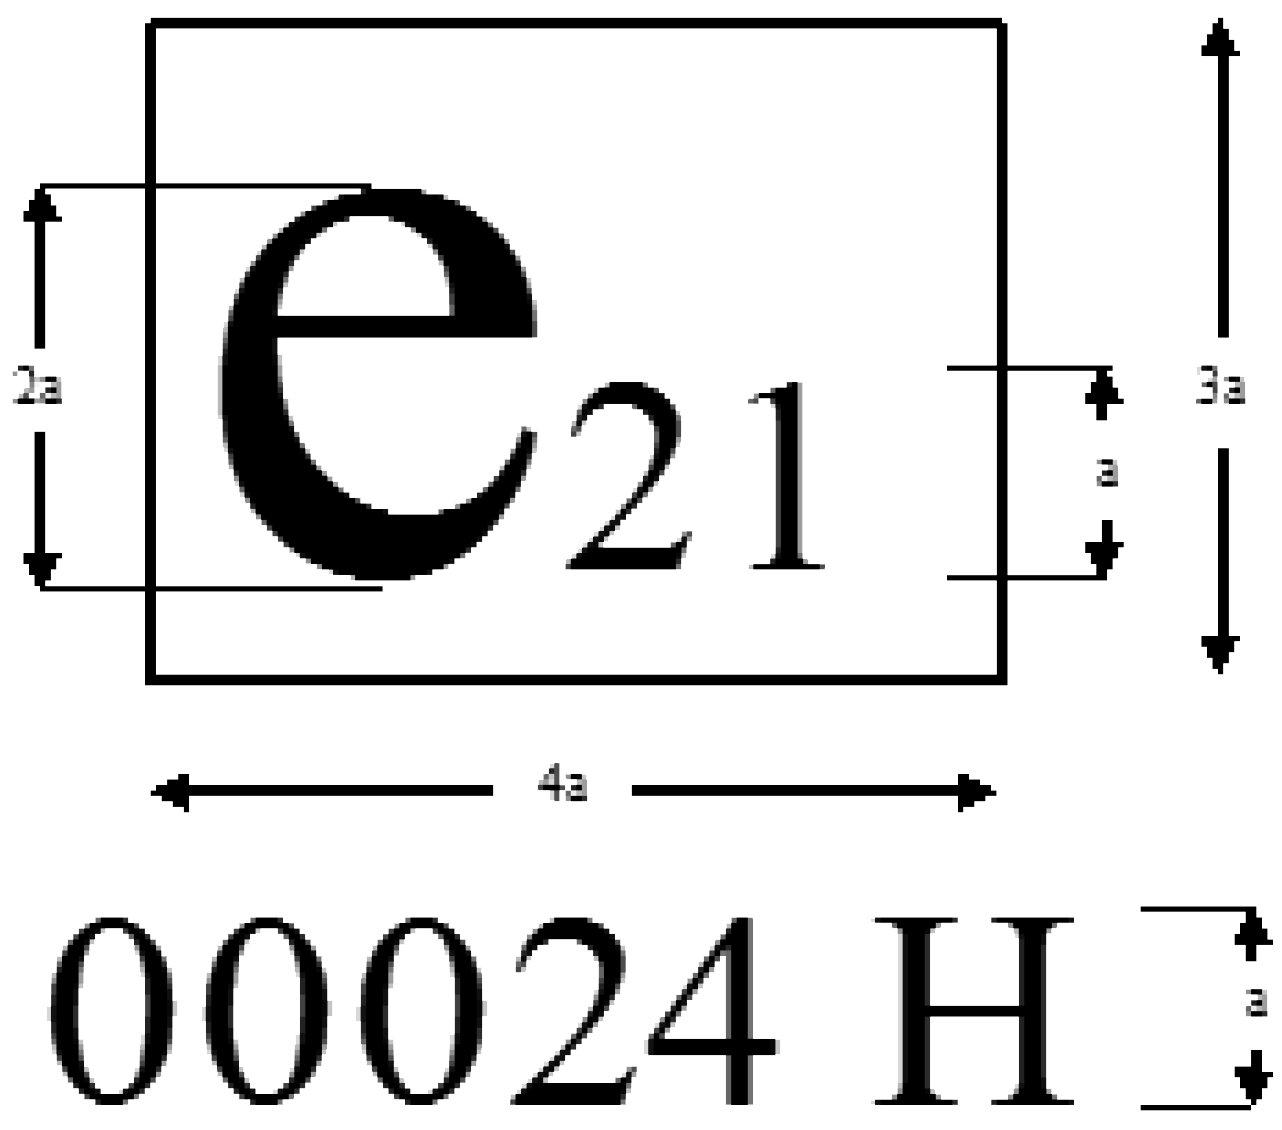 EUR-Lex - 02014R0901-20161016 - EN - EUR-Lex